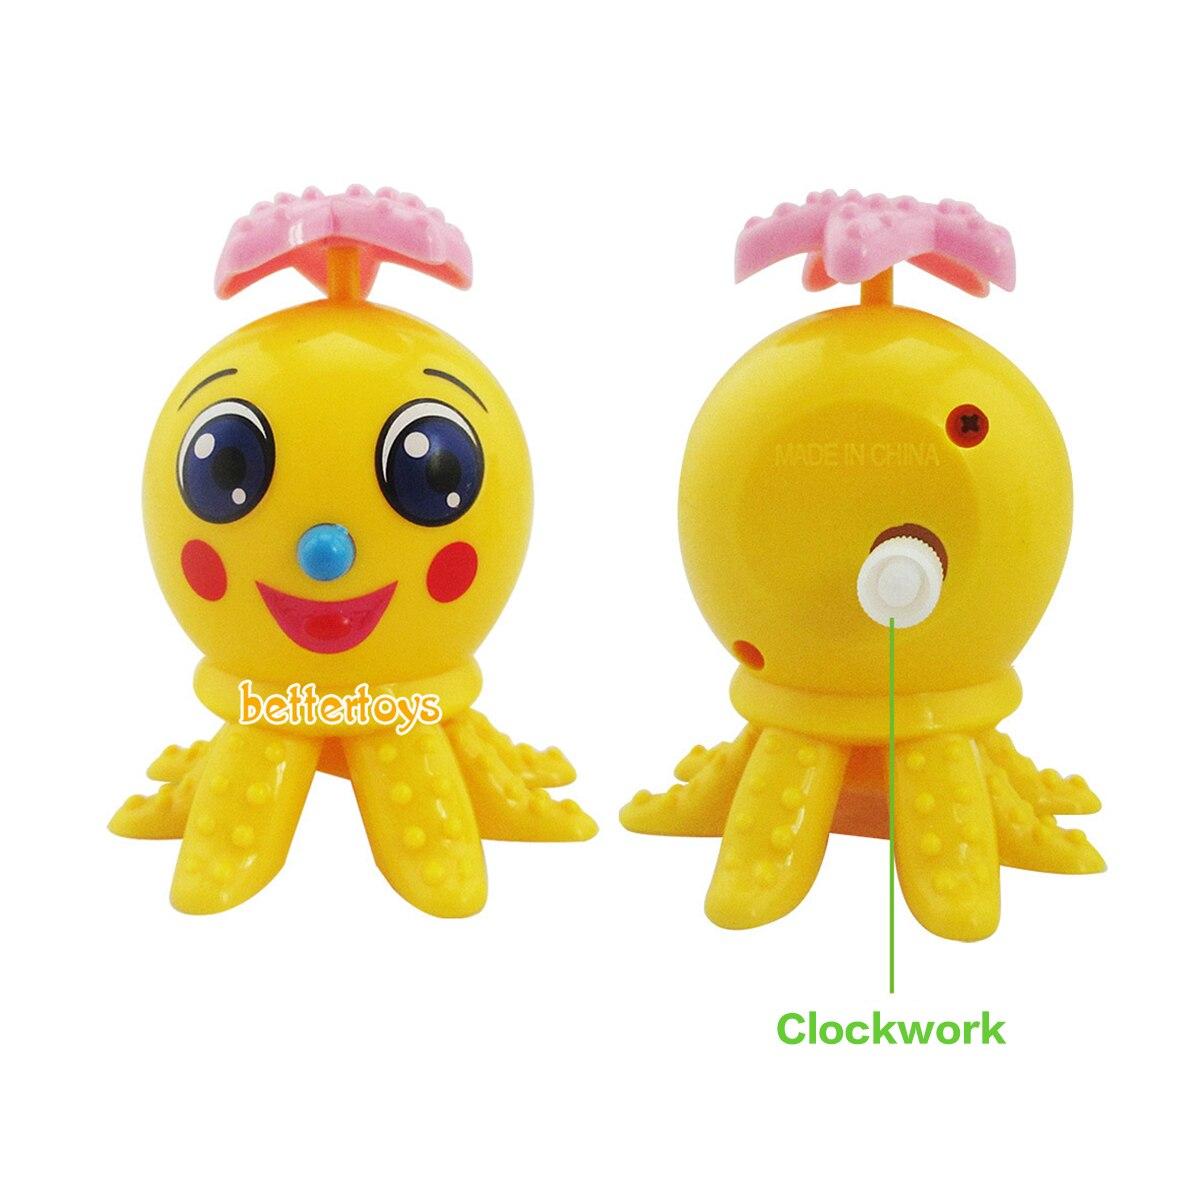 Wind Up Cartoon Chicken Plastic Clockwork Toys Children Educational Toy new.